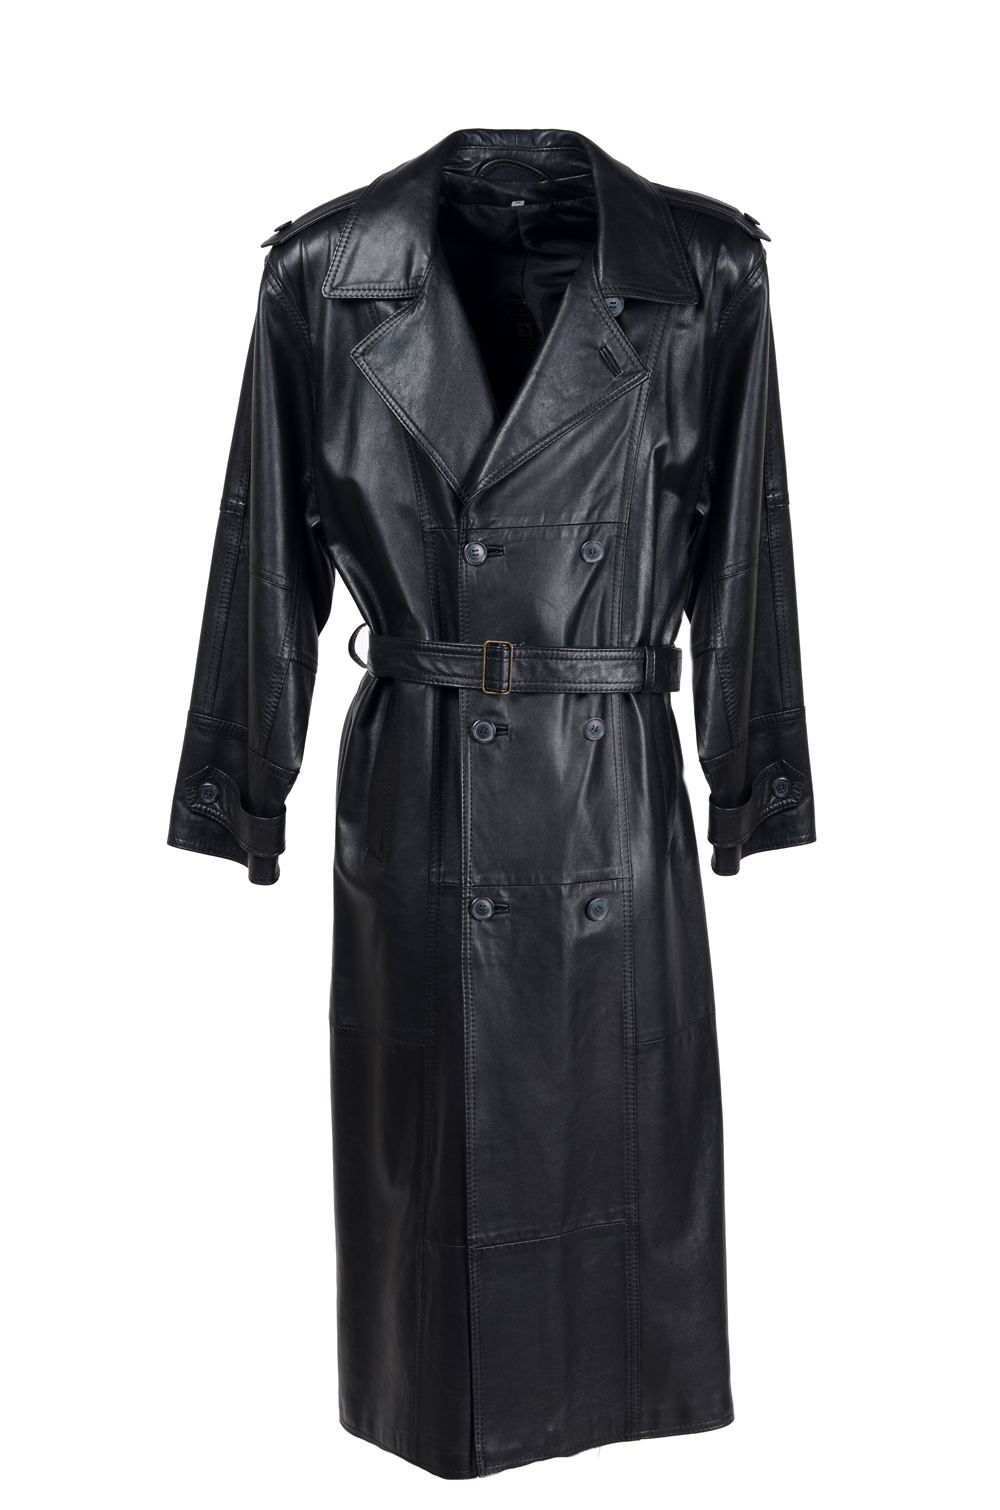 Pánské oděvy   Kožené oděvy   Kožené kabáty  05fde31bc9a